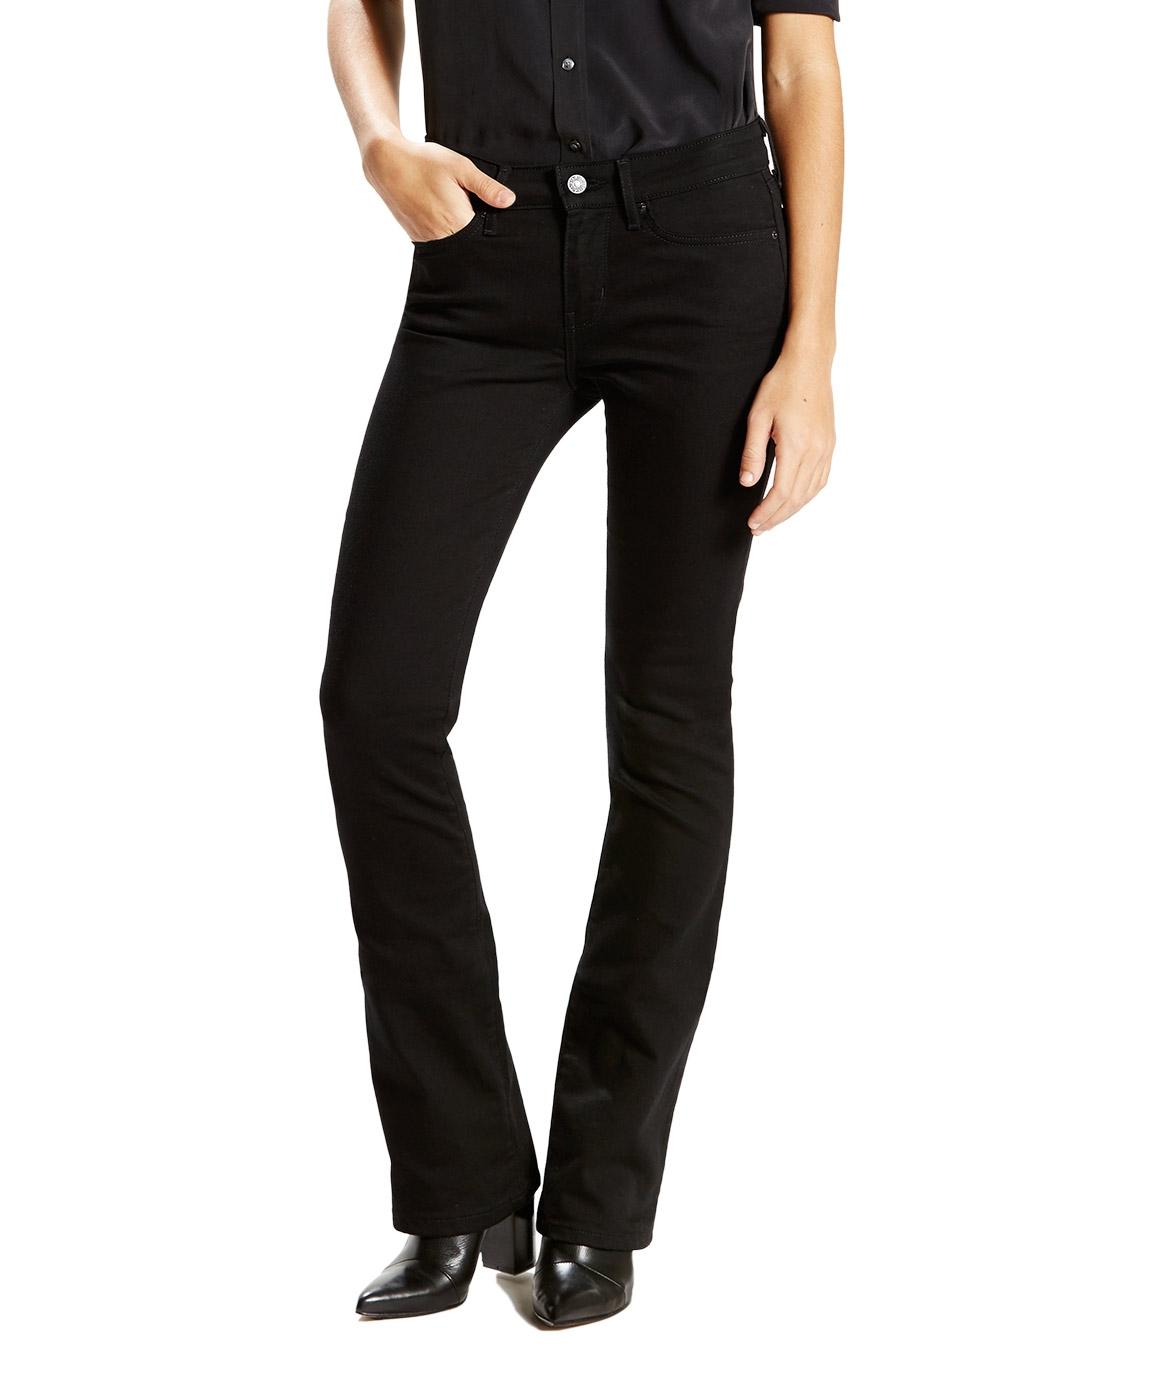 Hosen für Frauen - LEVI'S 715 Bootcut Jeans Slim Fit Black Sheep  - Onlineshop Jeans Meile